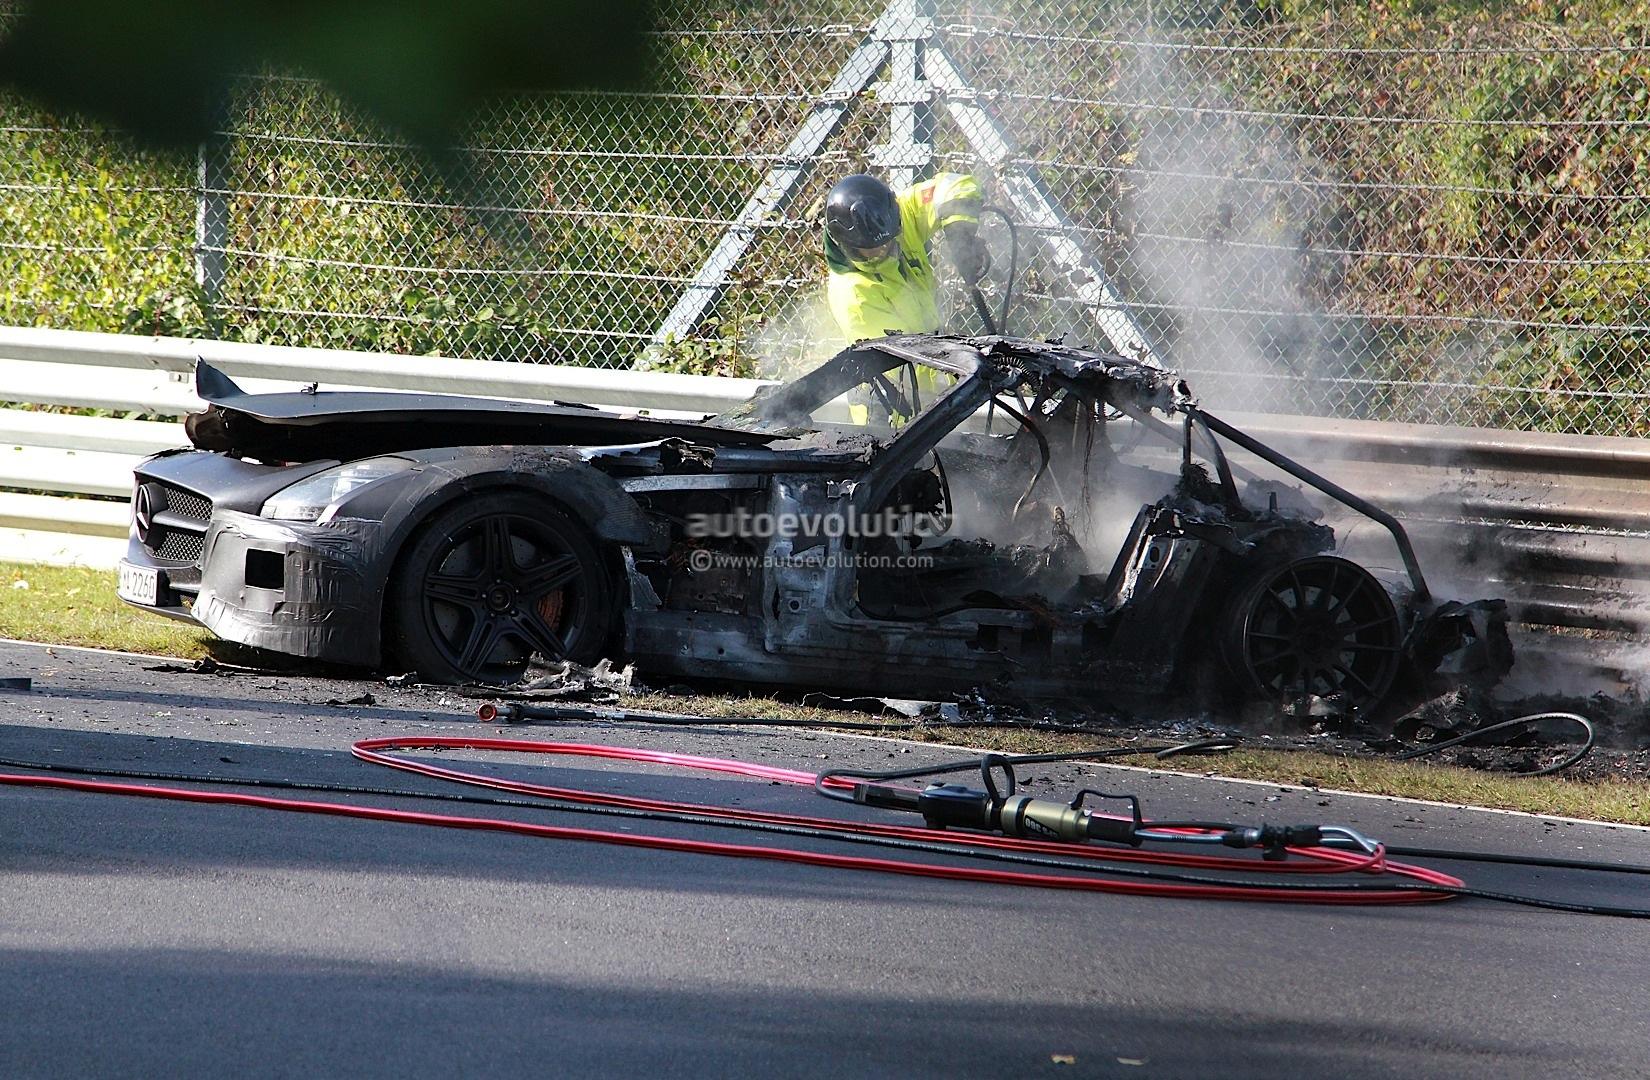 Gtr Race Car Crash At The Nurburgring